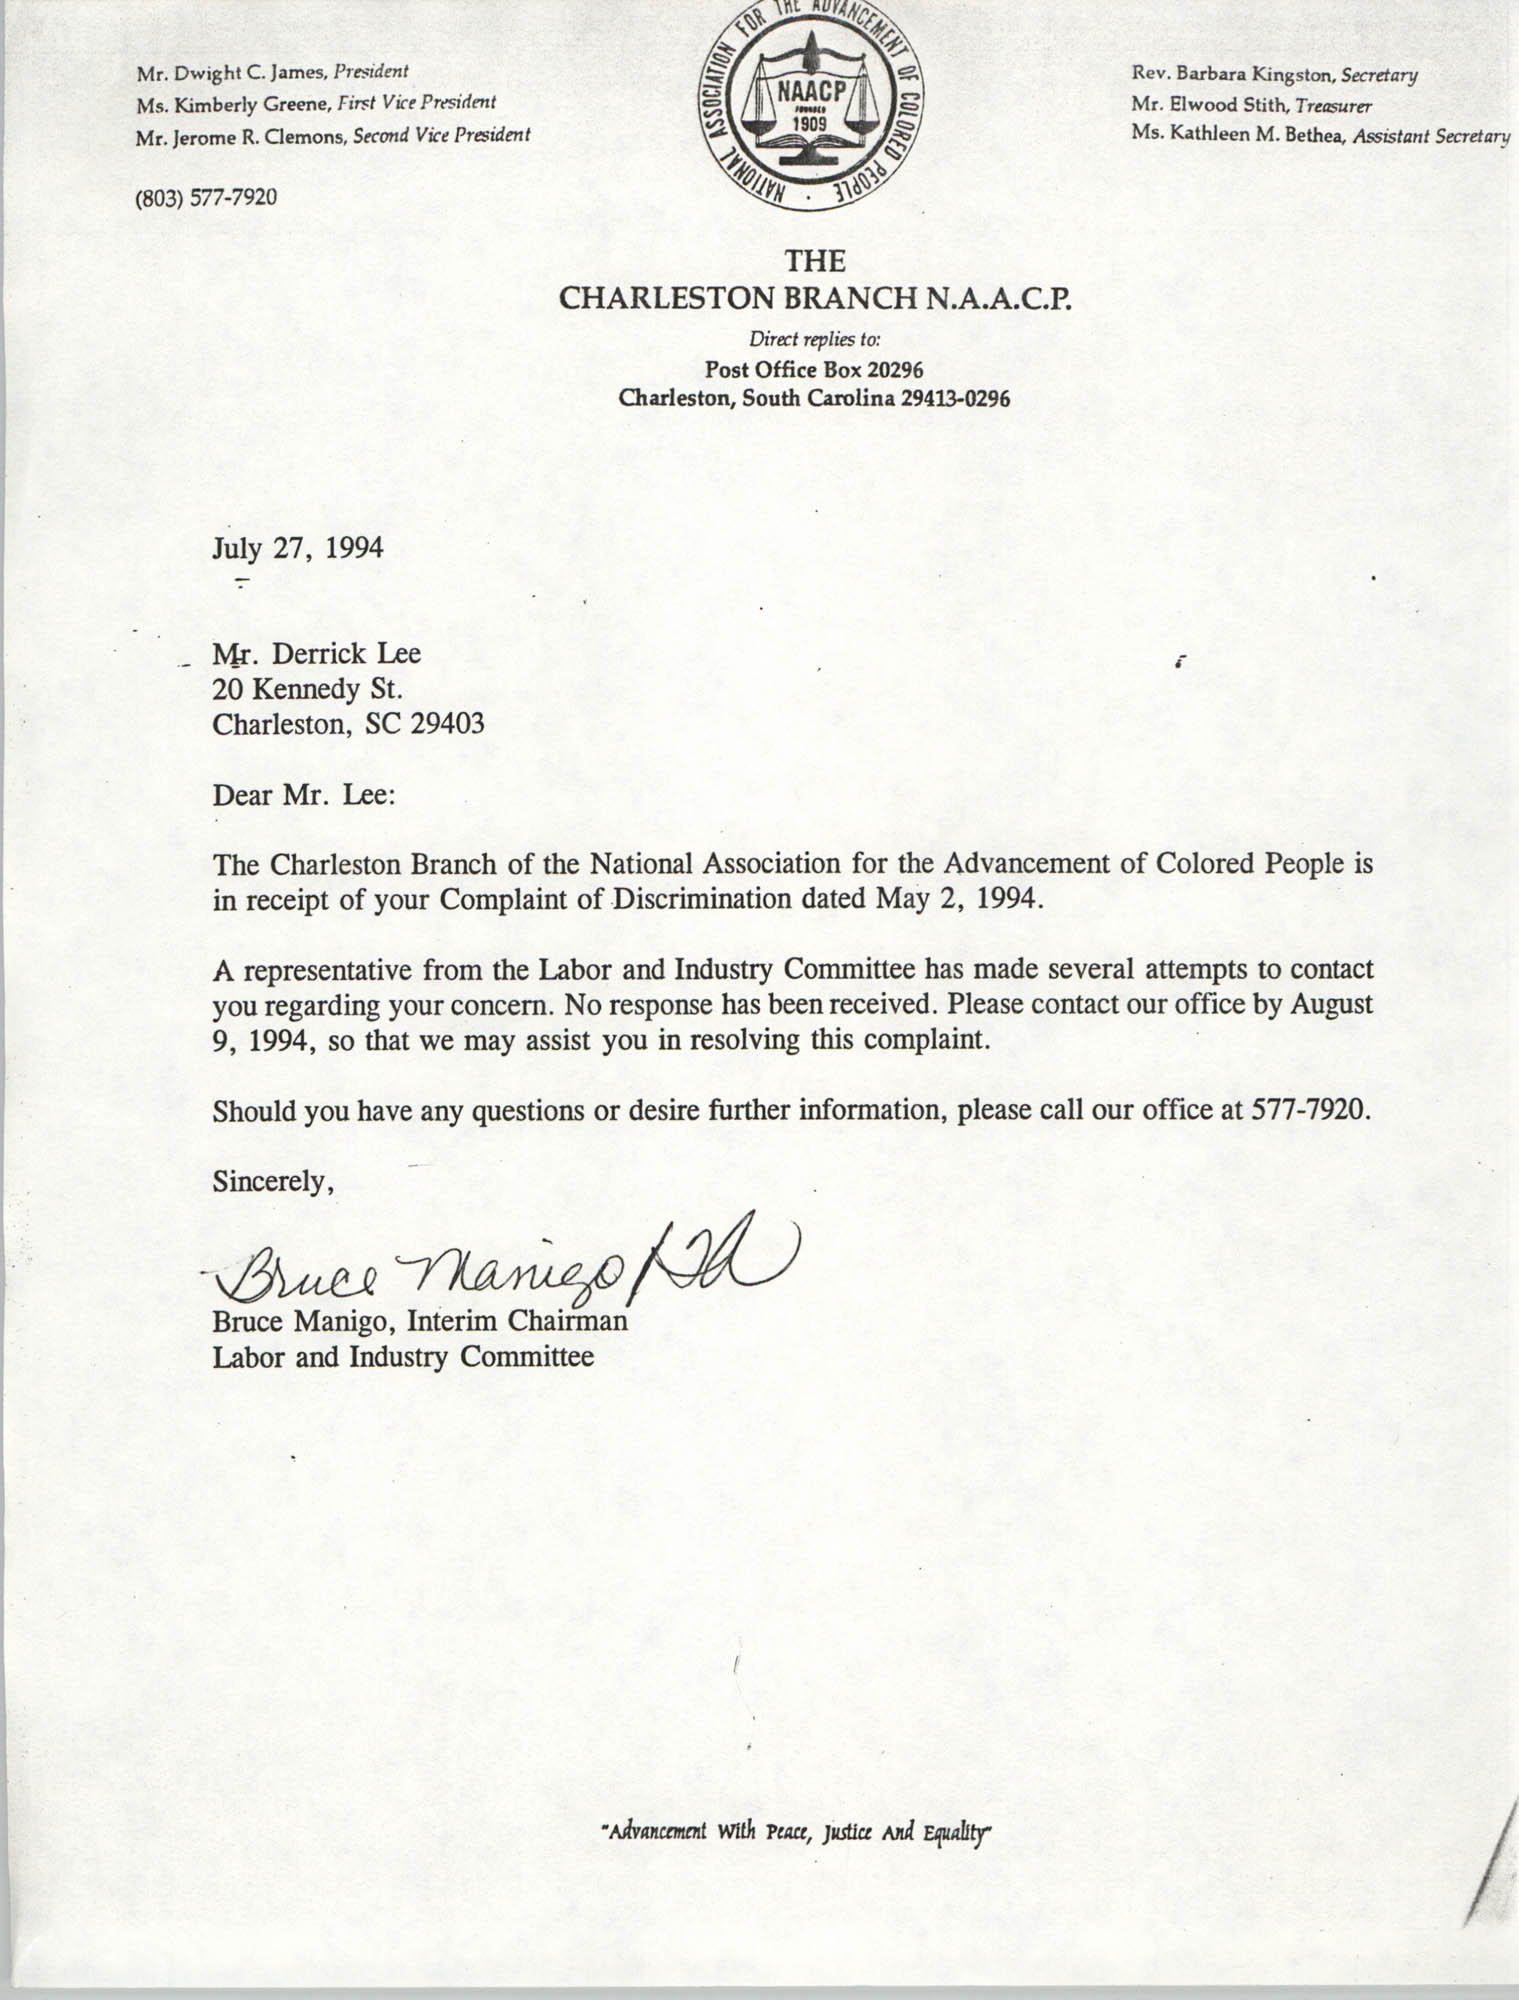 Letter from Bruce Manigo to Derrick Lee, July 27, 1994